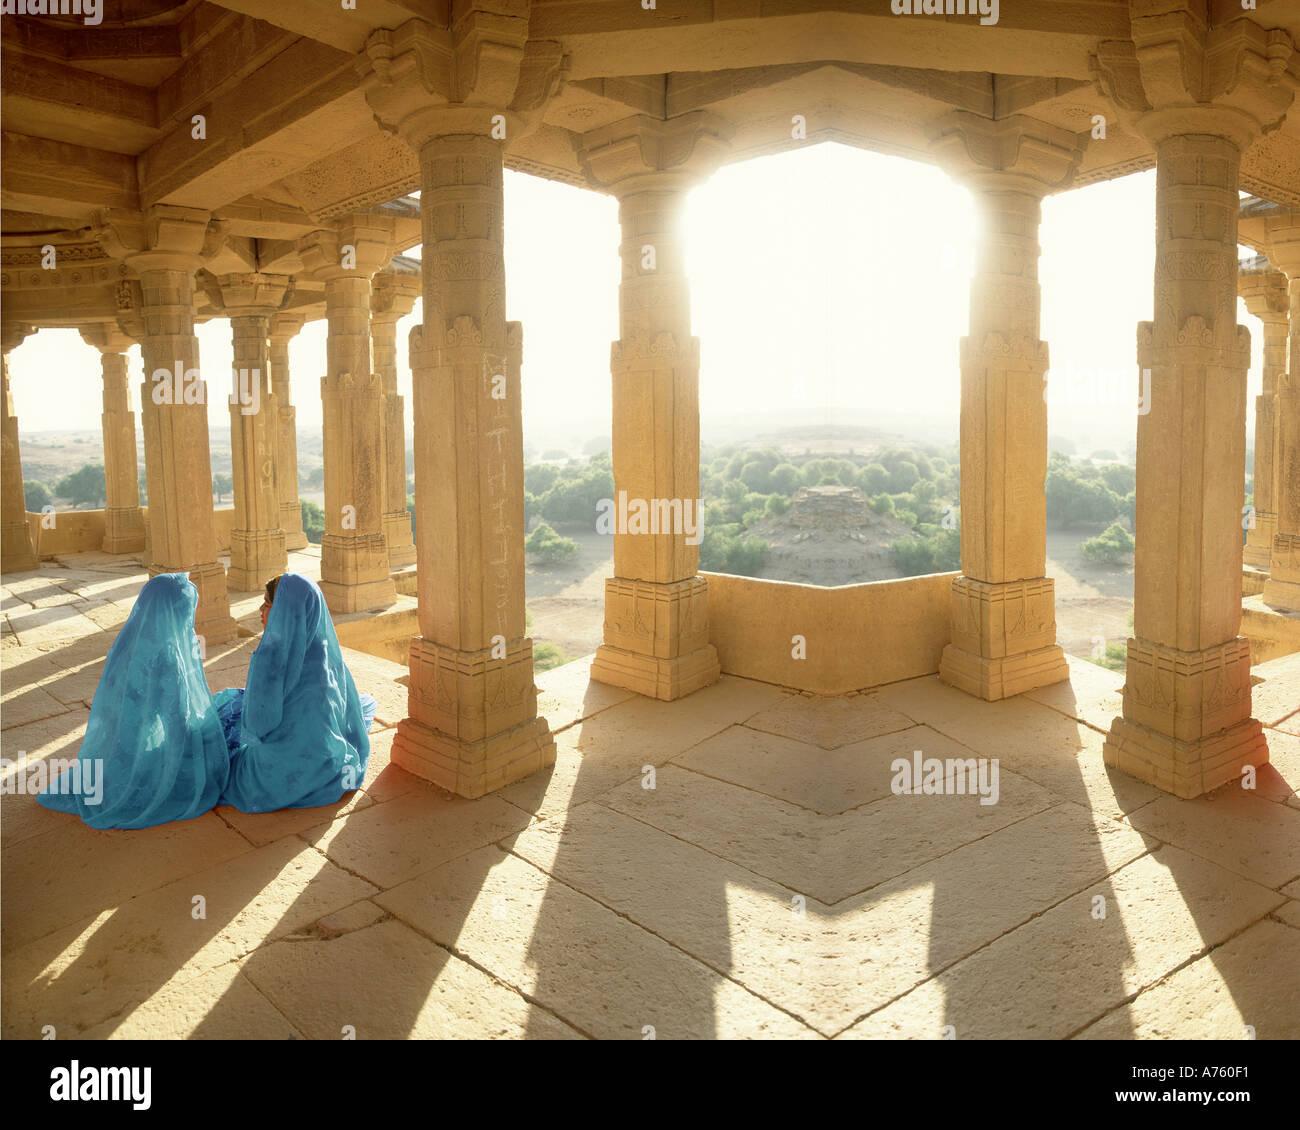 Indian women, Jaiselmer, Rajasthan, India - Stock Image